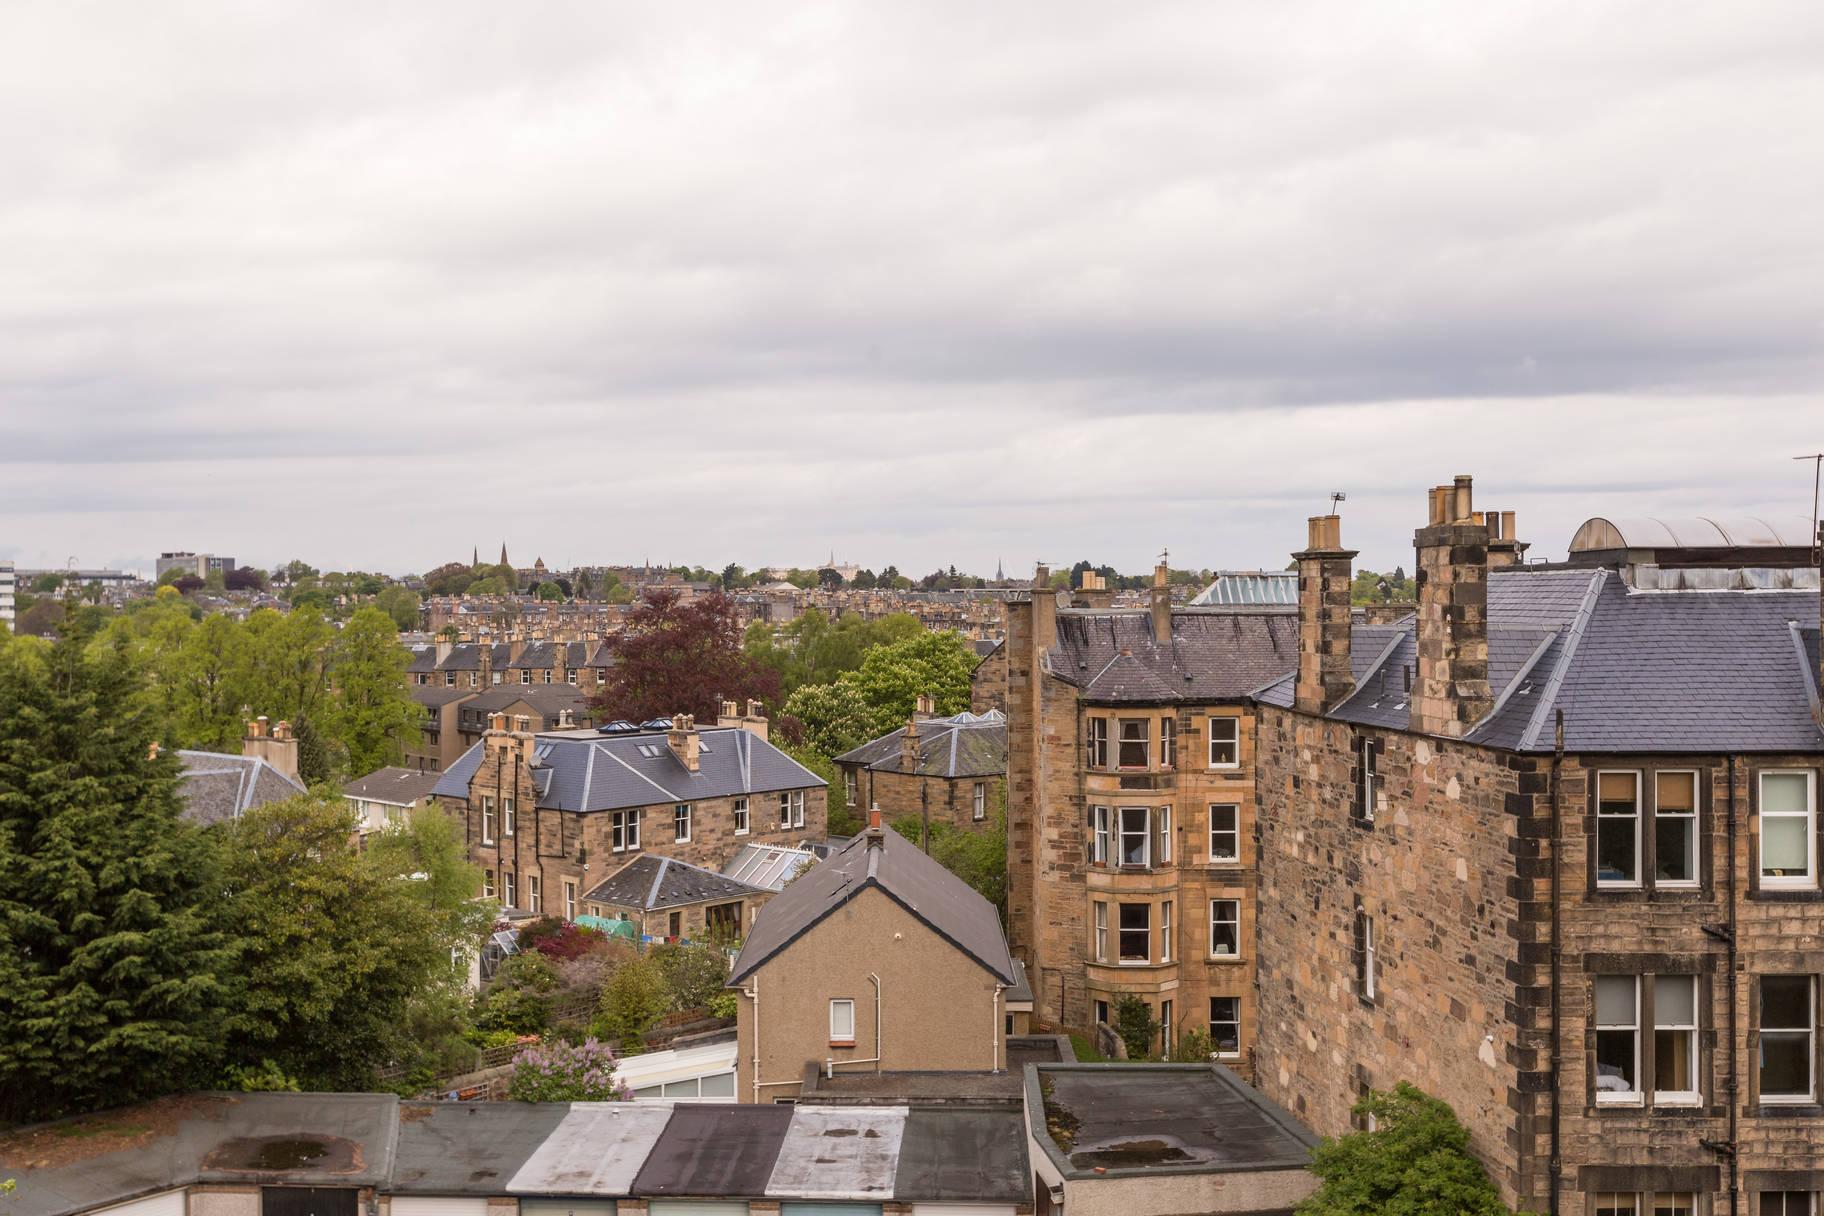 12/29 Ethel Terrace, Morningside, Edinburgh, EH10 5NA